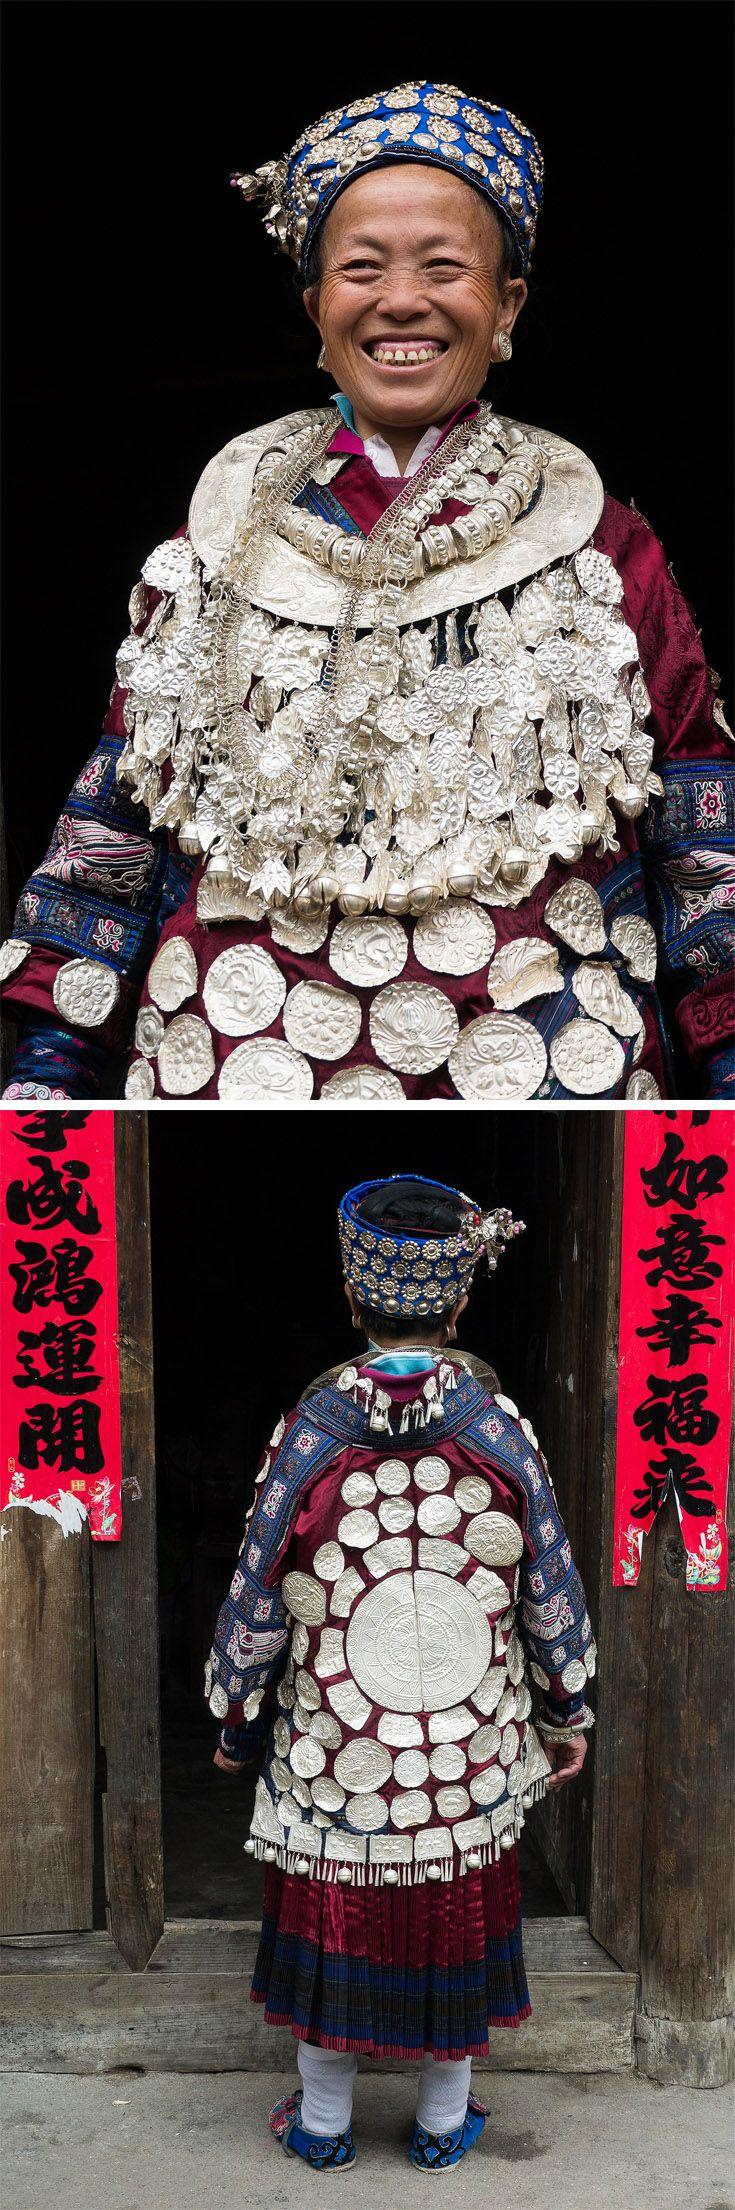 "China | ""Wengxiang Village, Geyi Sytle Miao"". Southwest China, Guizhou minotiries. | ©Rita Willaert"